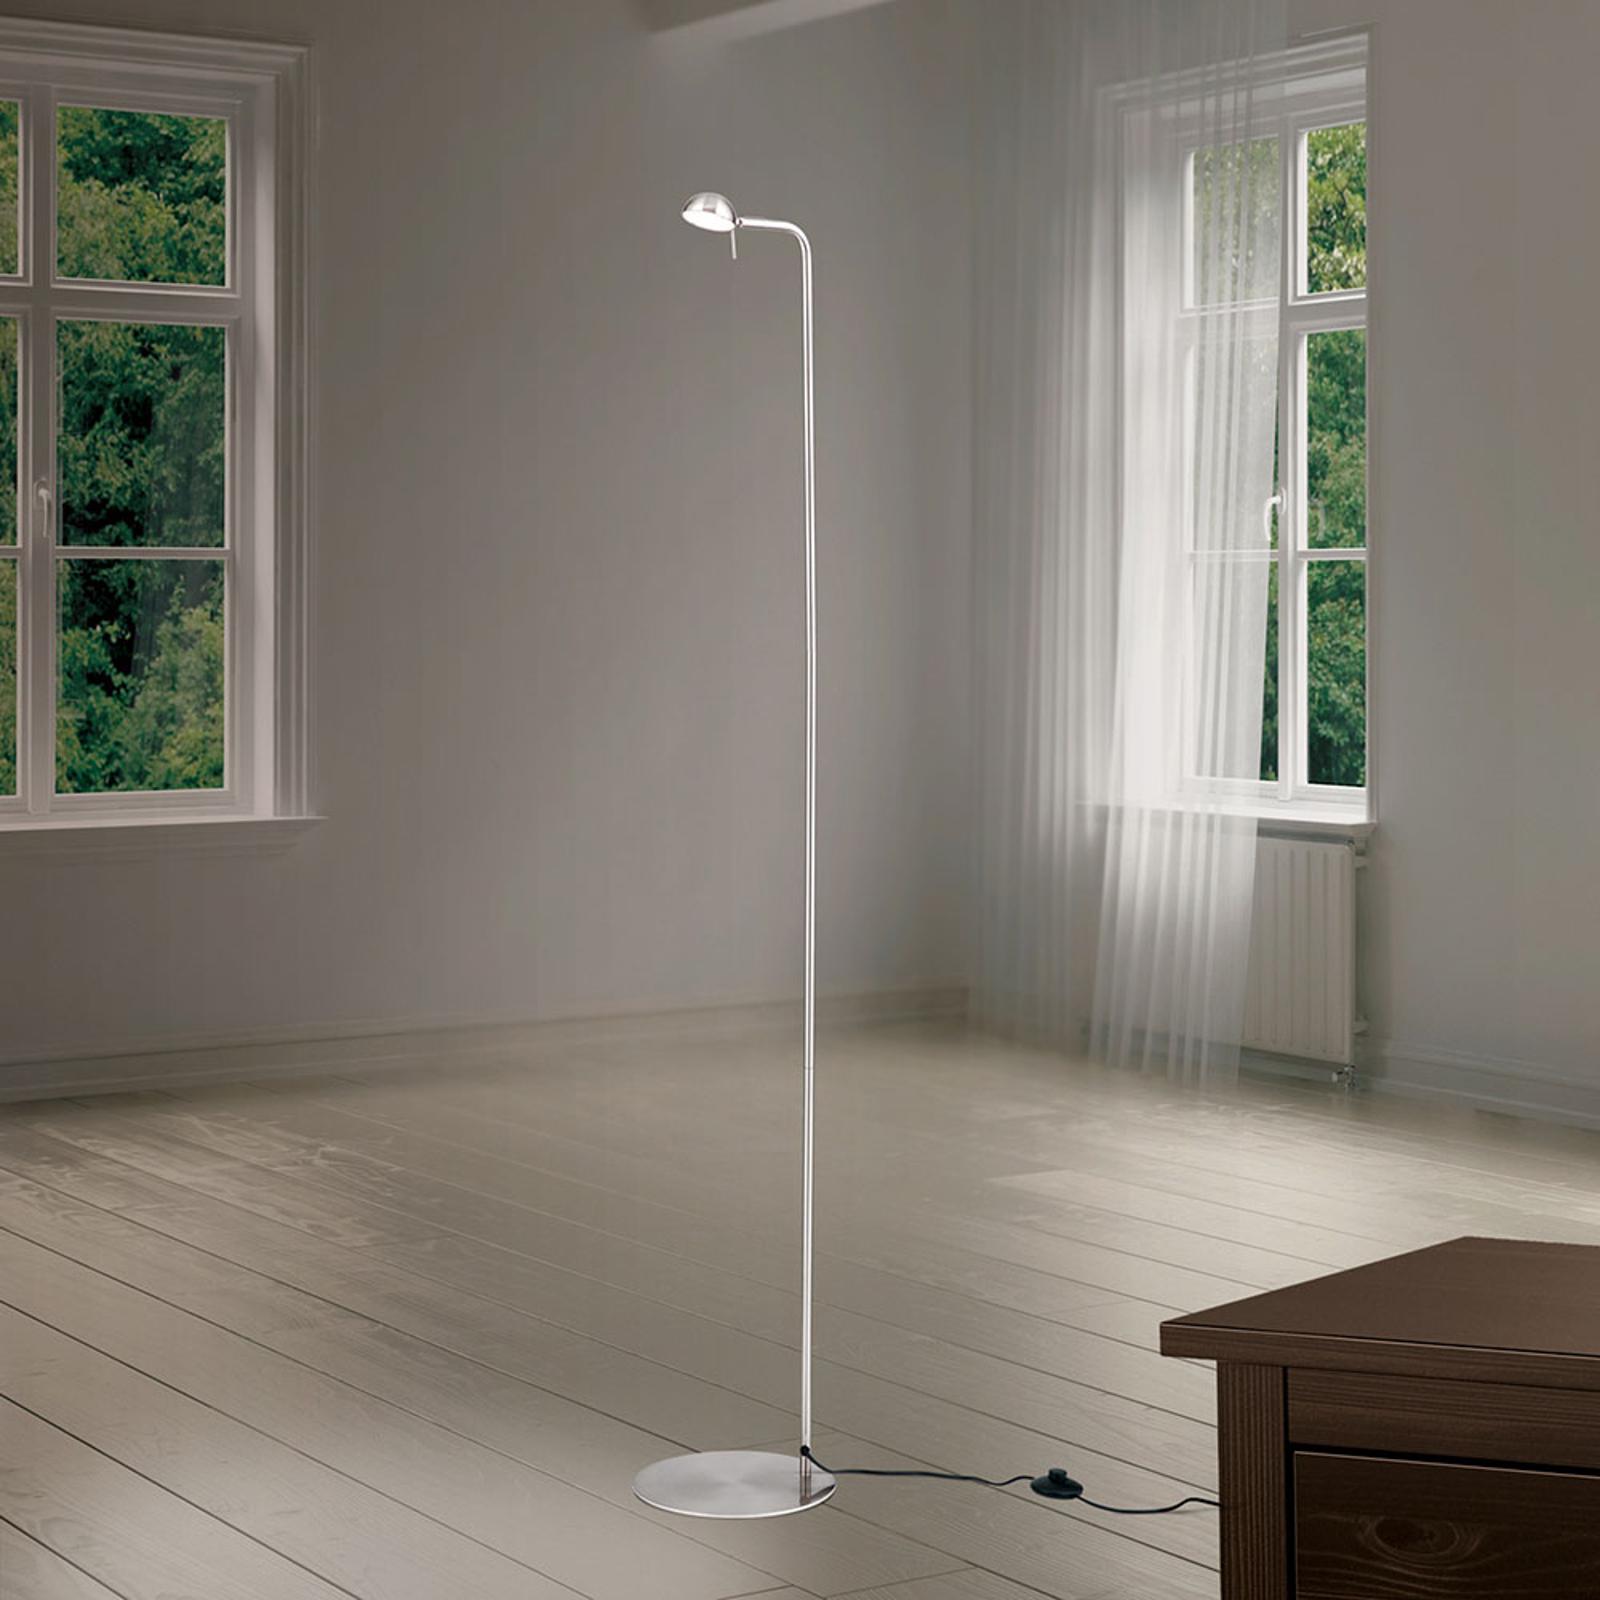 Acquista Lampada LED da terra Student paralume orientabile